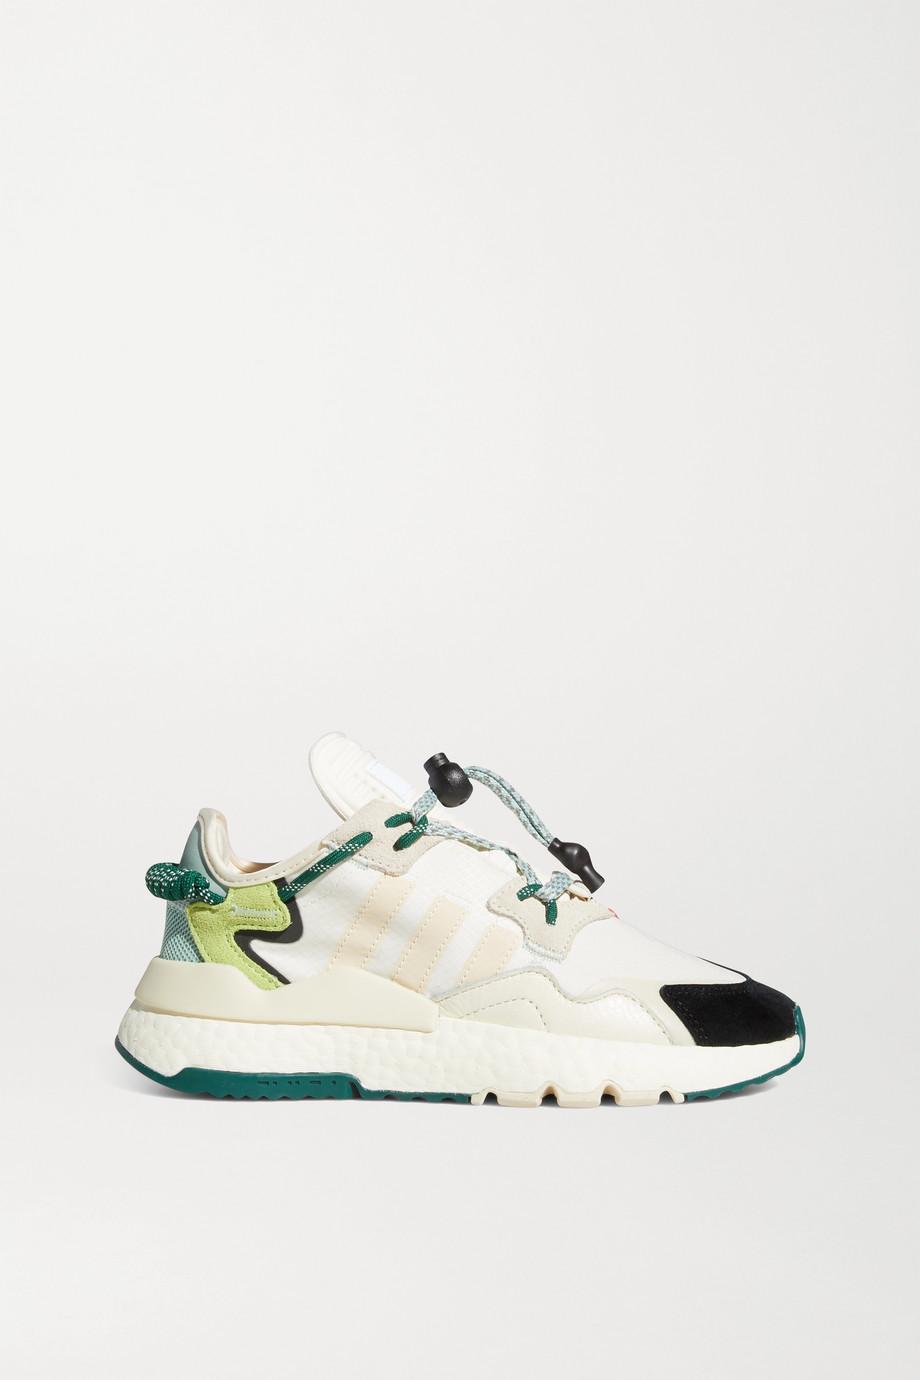 adidas Originals + Ivy Park Nite Jogger ripstop, neoprene and suede sneakers